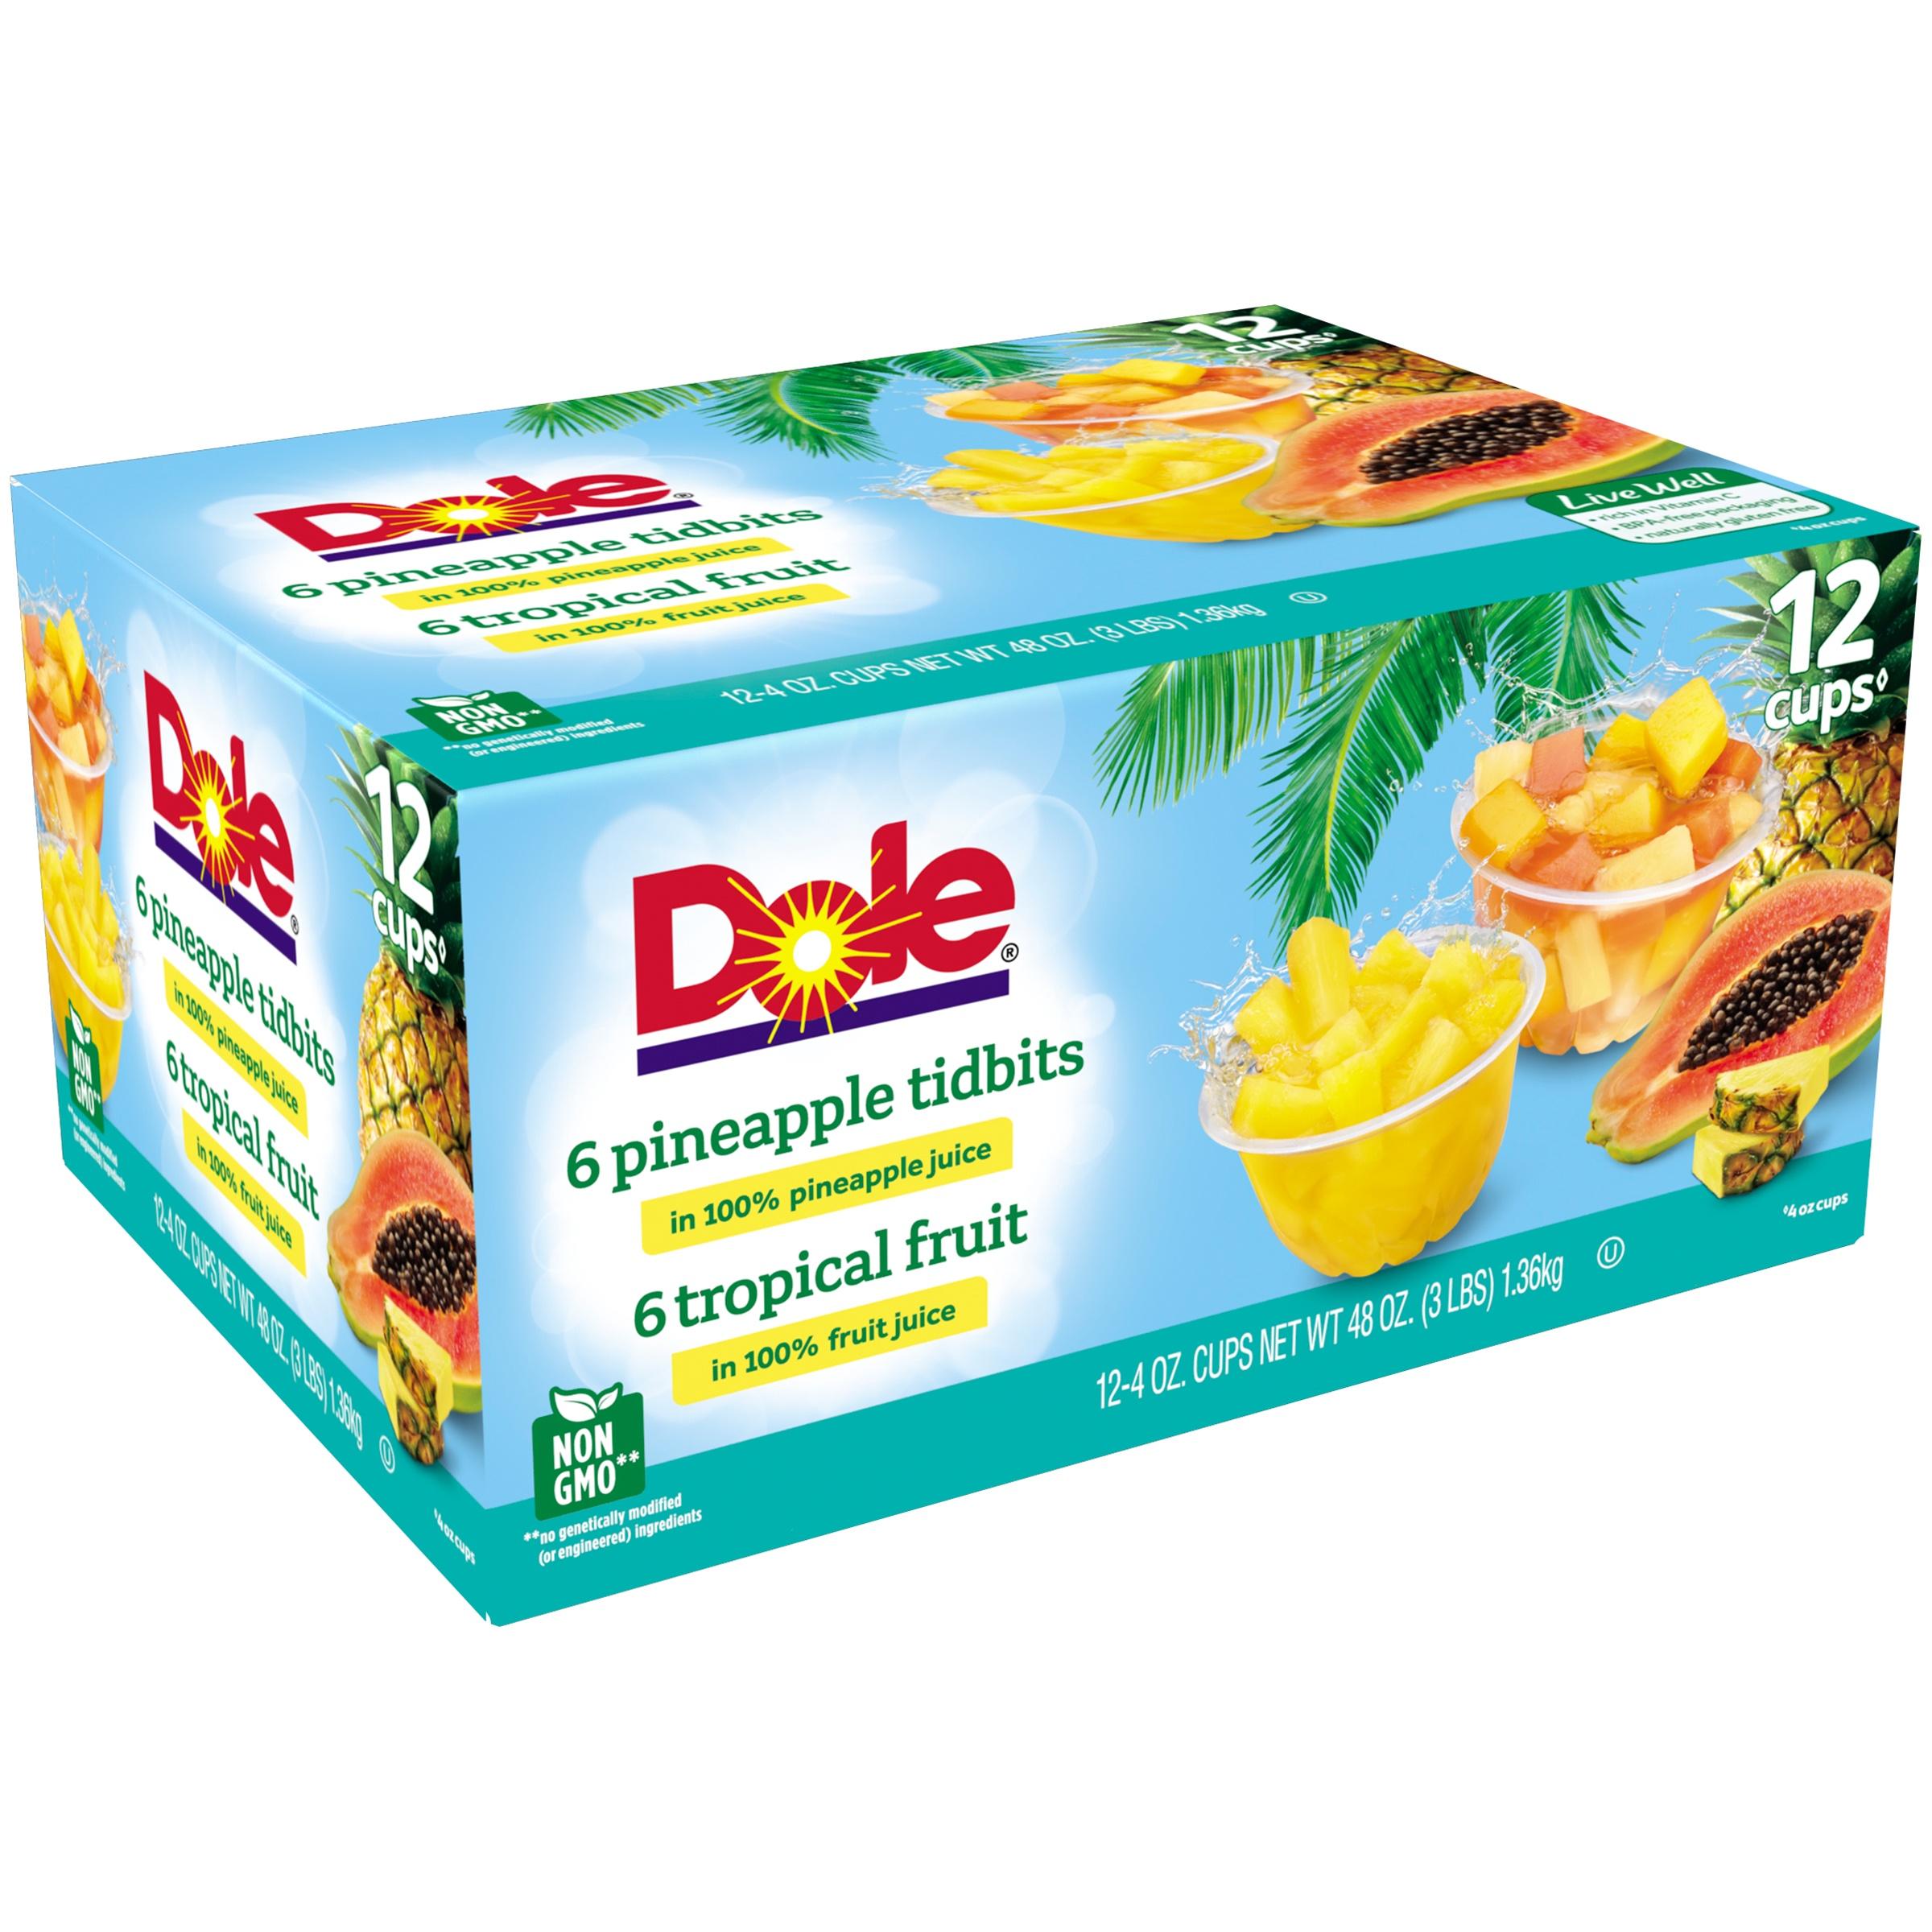 (2 Pack) Dole Fruit Bowls Tropical Fruit & Pineapple Tidbits in 100% Fruit Juice, 12 - 4 oz cups